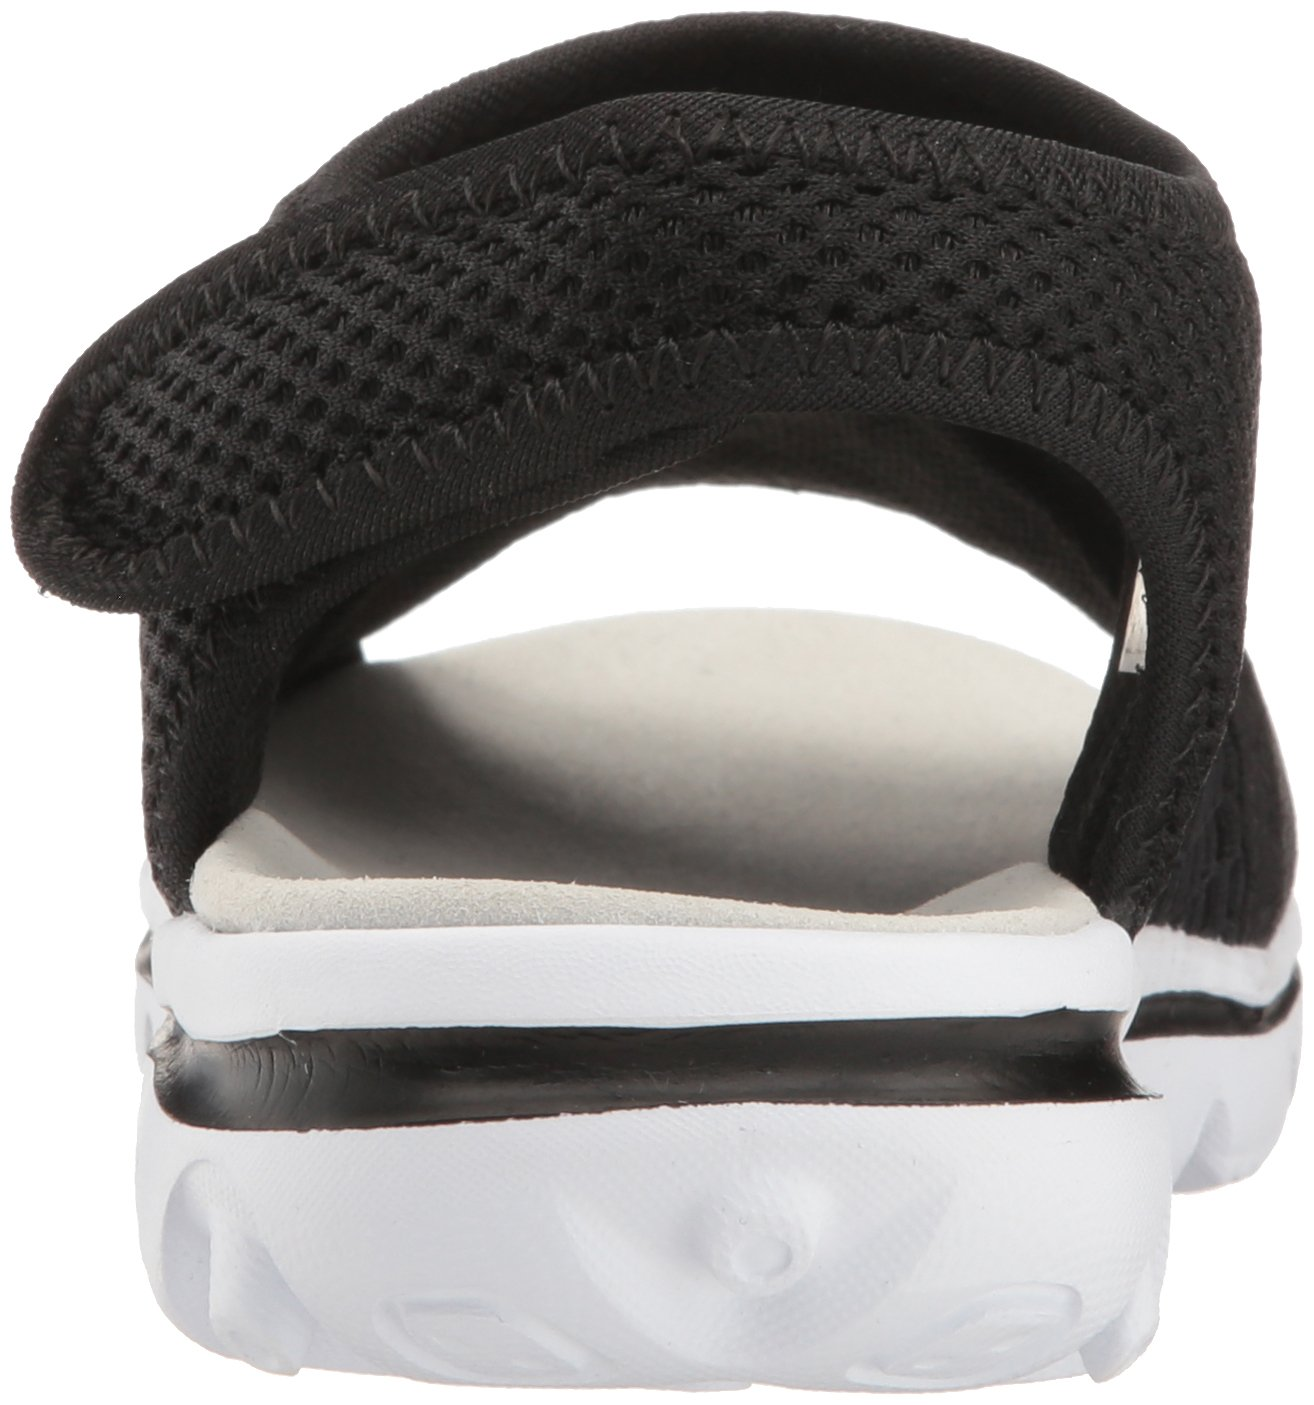 Propet B01IODEL8Q Women's TravelActiv Ss Sandal B01IODEL8Q Propet 9 2A US|Black 47f6a2